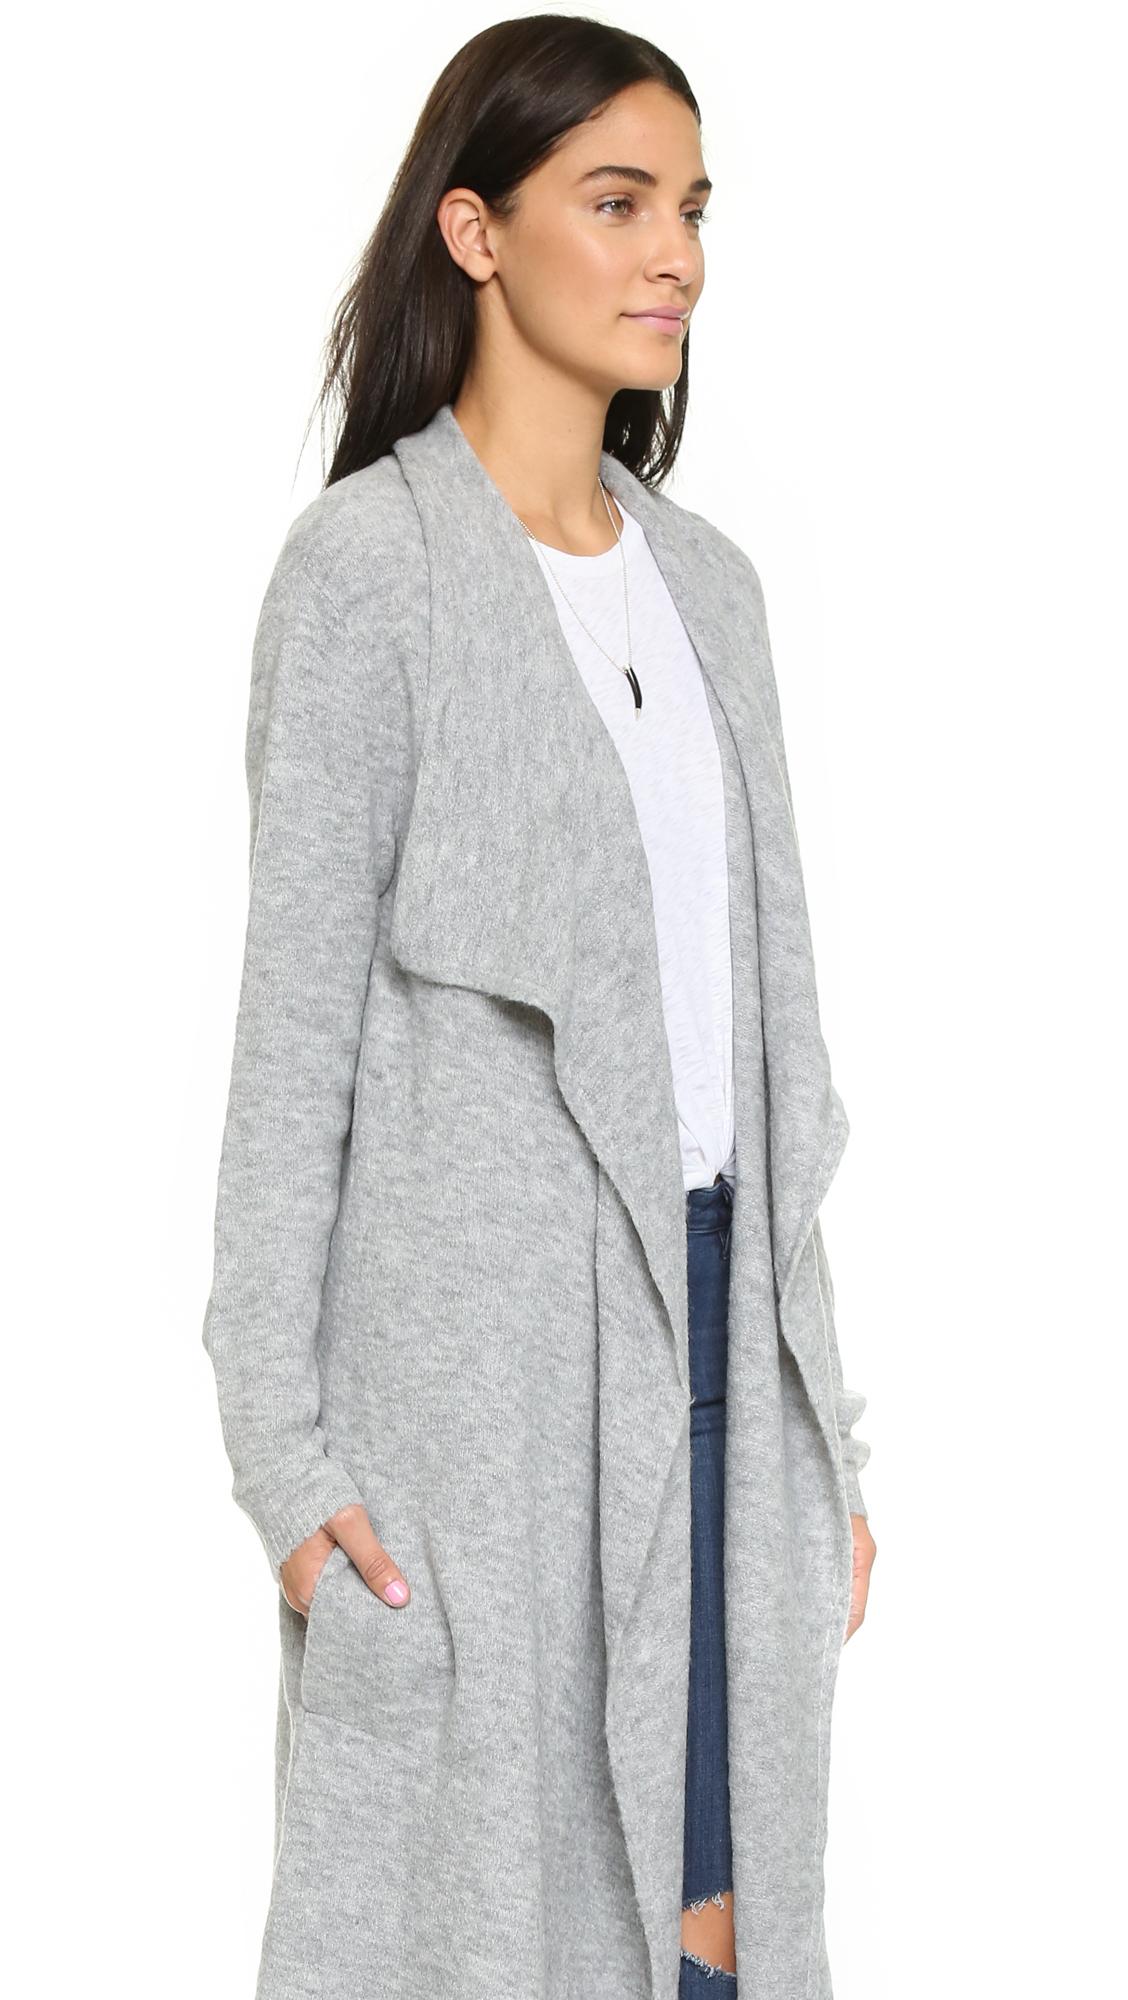 Bb dakota Tabbetha Cardigan - Grey in Gray | Lyst